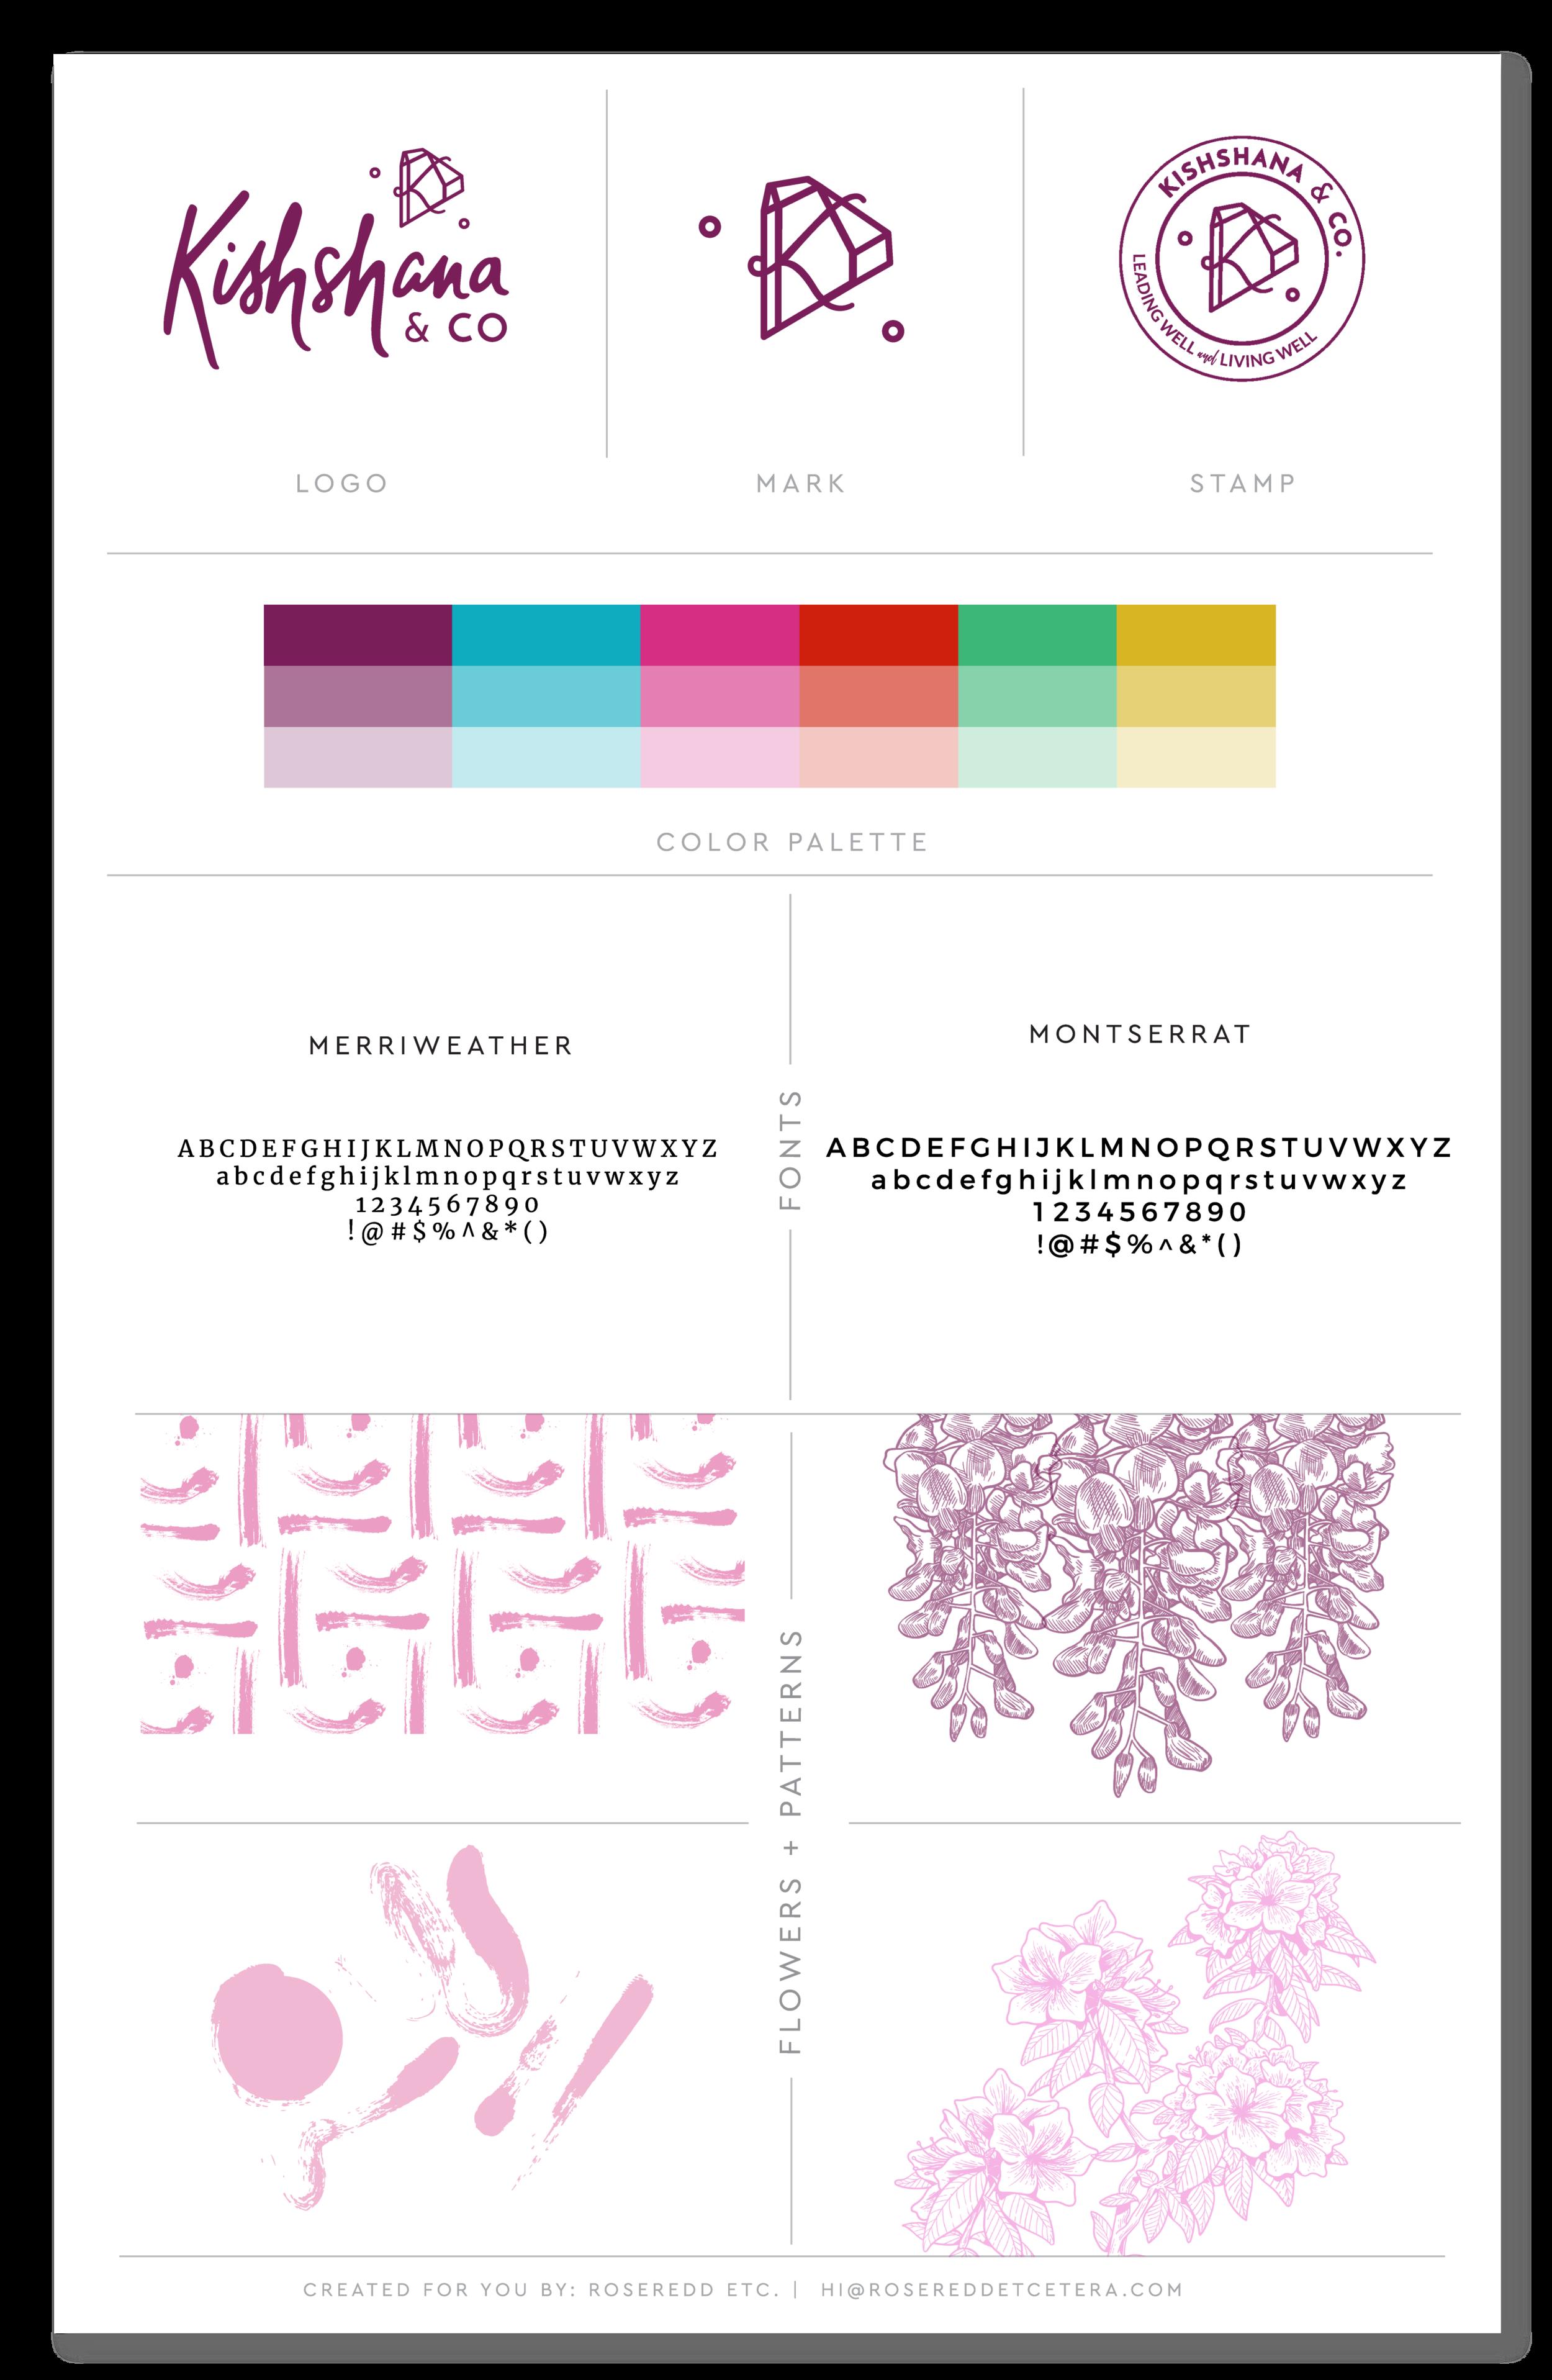 Rosereddetc_KishshanaCo_Brand_Style_Guide